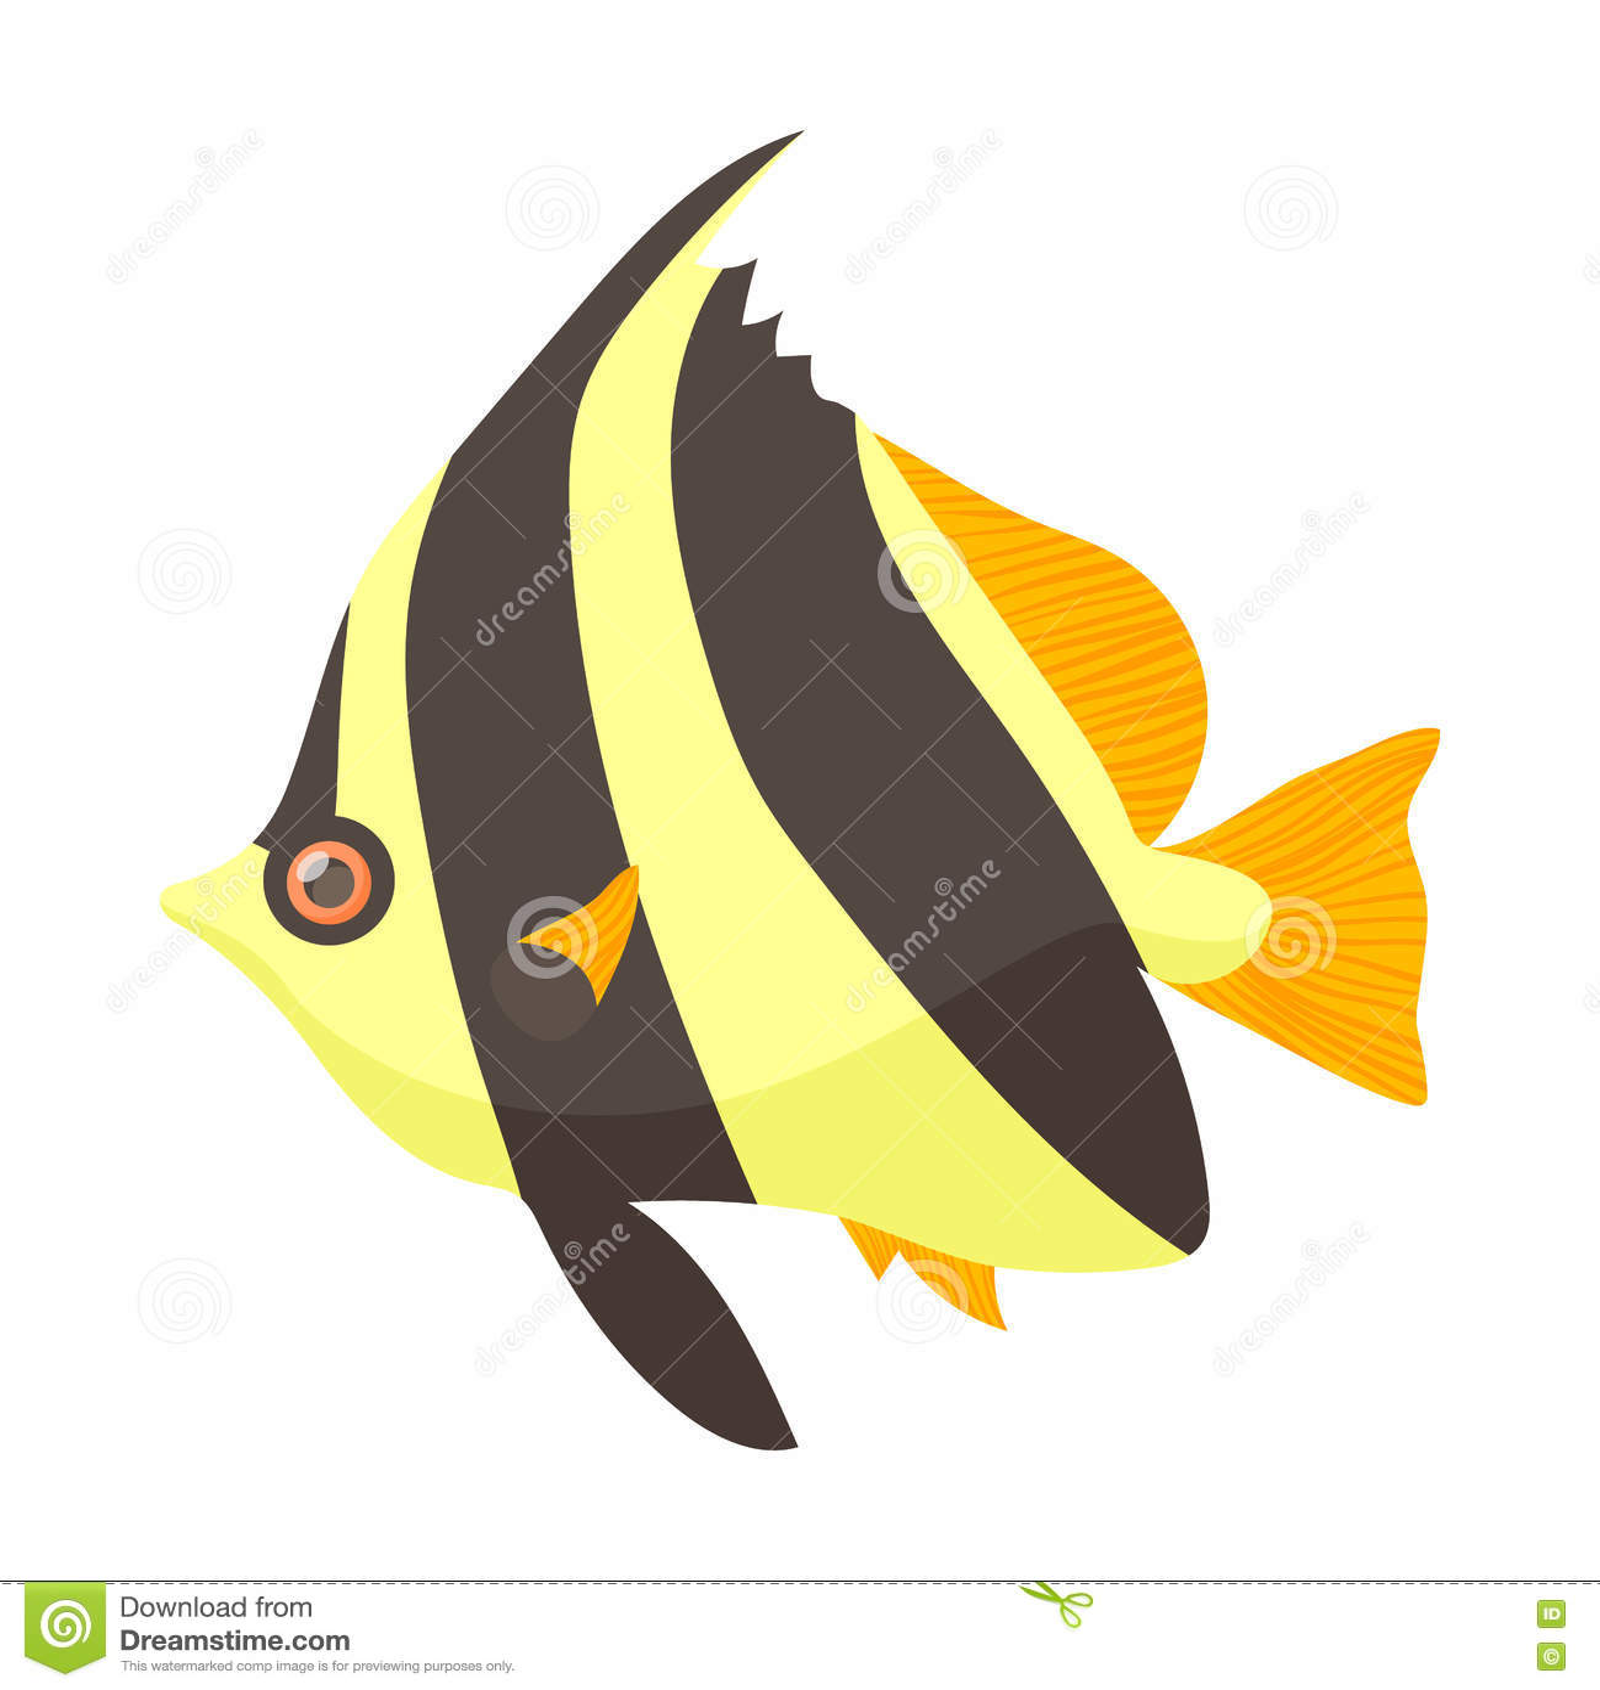 Moroccan geometric pattern royalty free stock photos image 13547078 - Moorish Idol Fish Icon Cartoon Style Stock Images